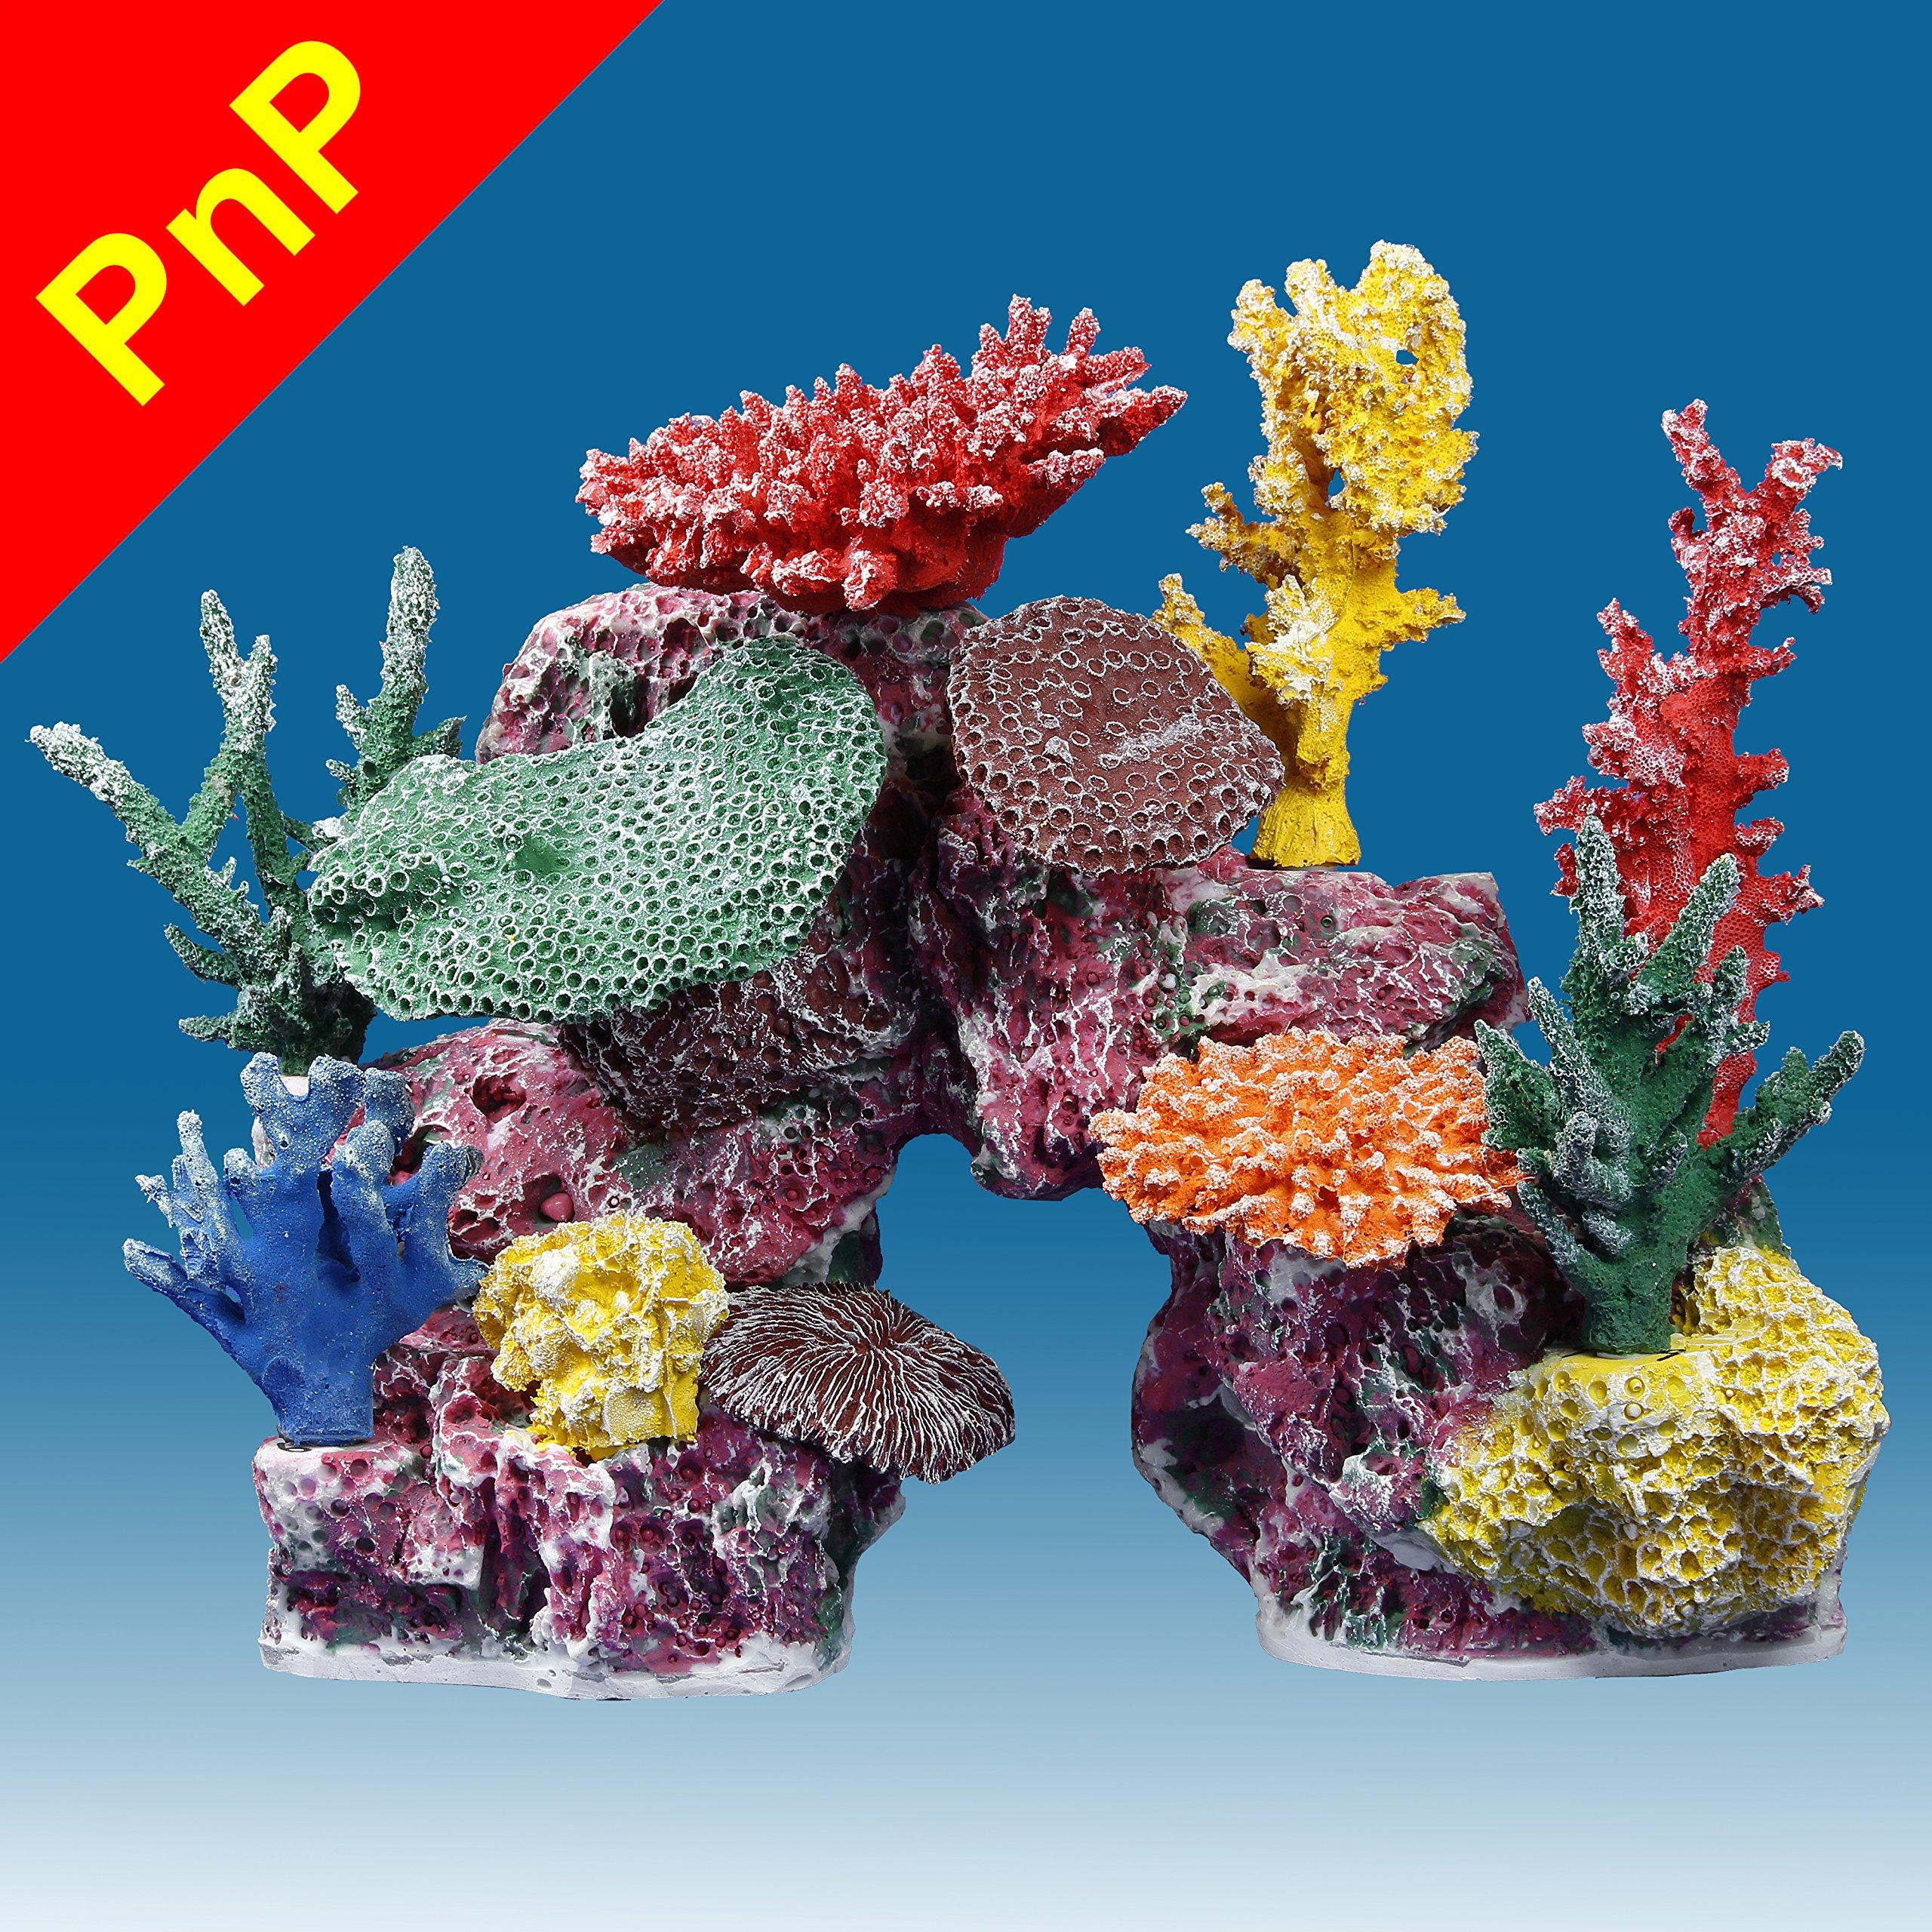 Instant Reef DM048PNP Aquarium Decorations Large, Fish Tank Décor Ornament, Artificial Coral Reef Aquarium for Freshwater, Marine and Saltwater Fish